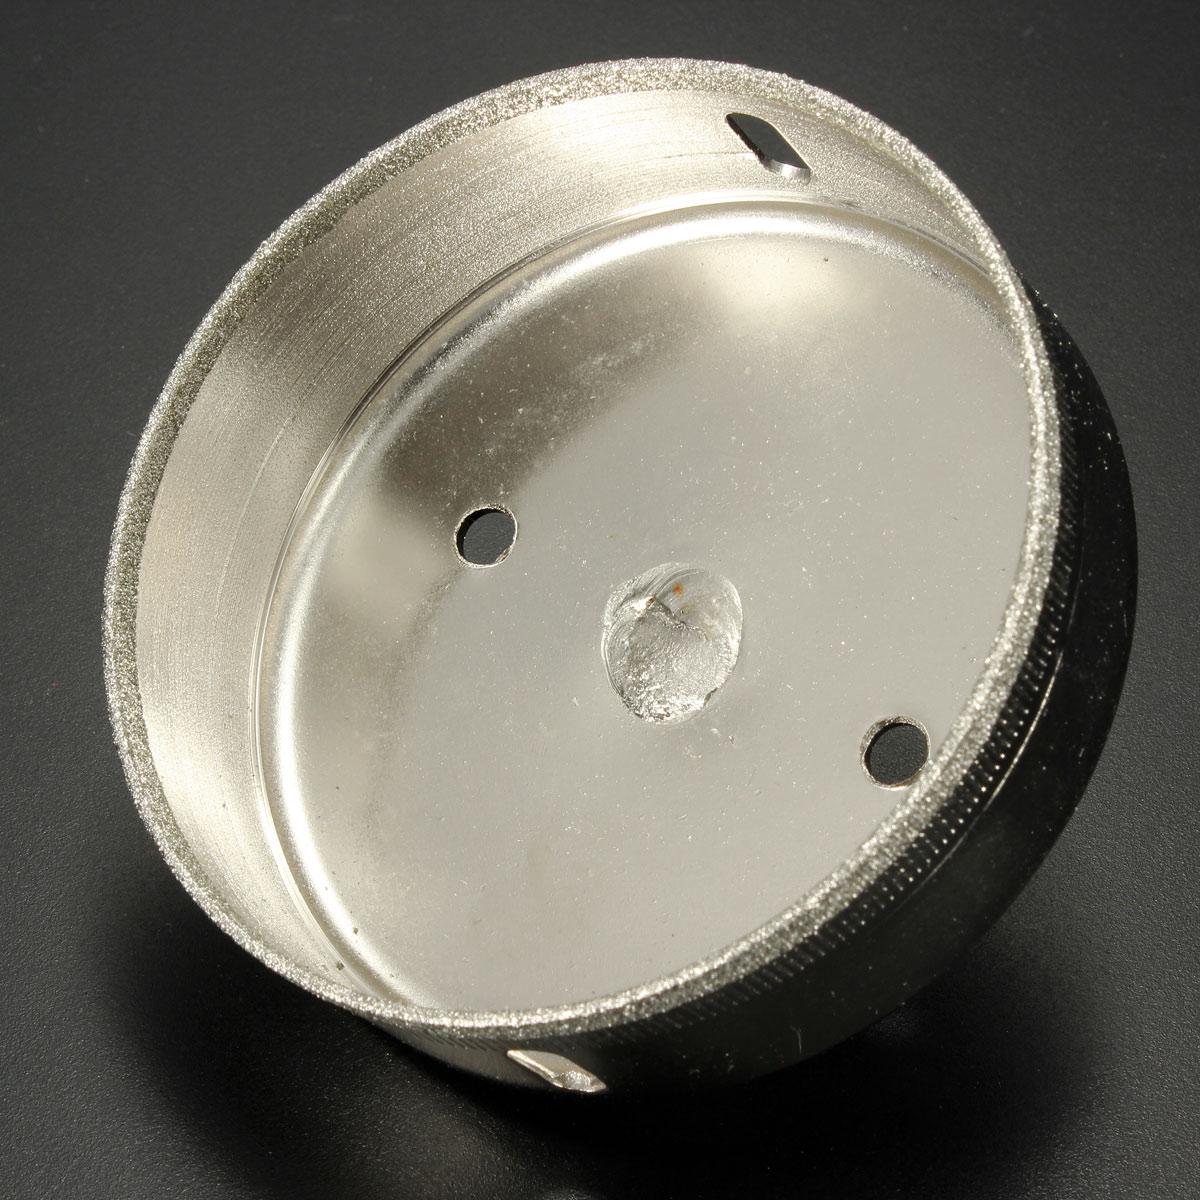 6mm-95mm Diamond Coated Drill Bit Hole Saw Kit Glass Cutter Tip